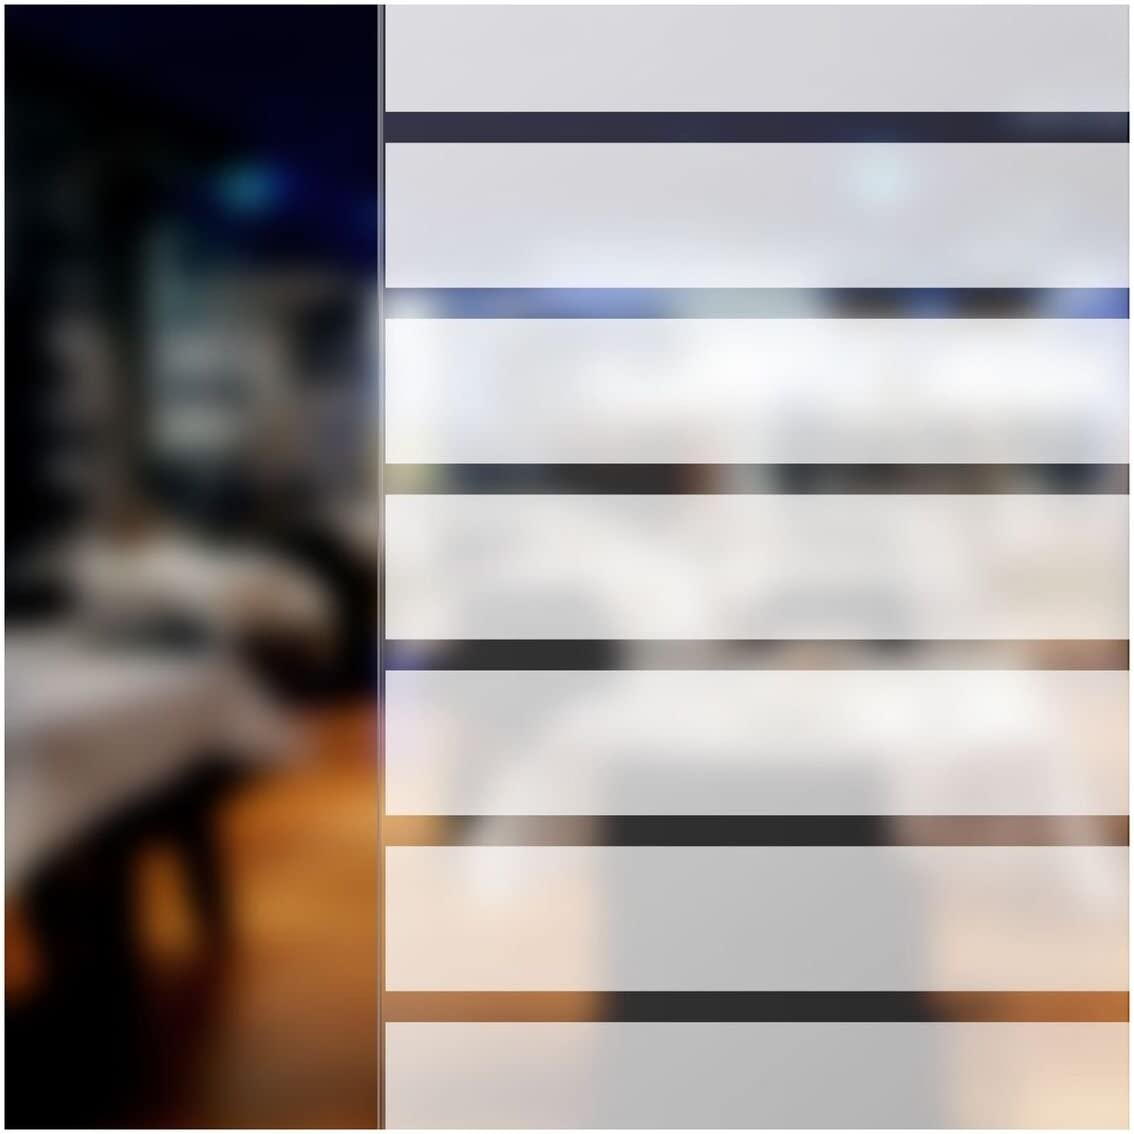 BDF BLP Window Film Blind Plus 1 3 4 Inch Wide Blinds – 36in X 25ft